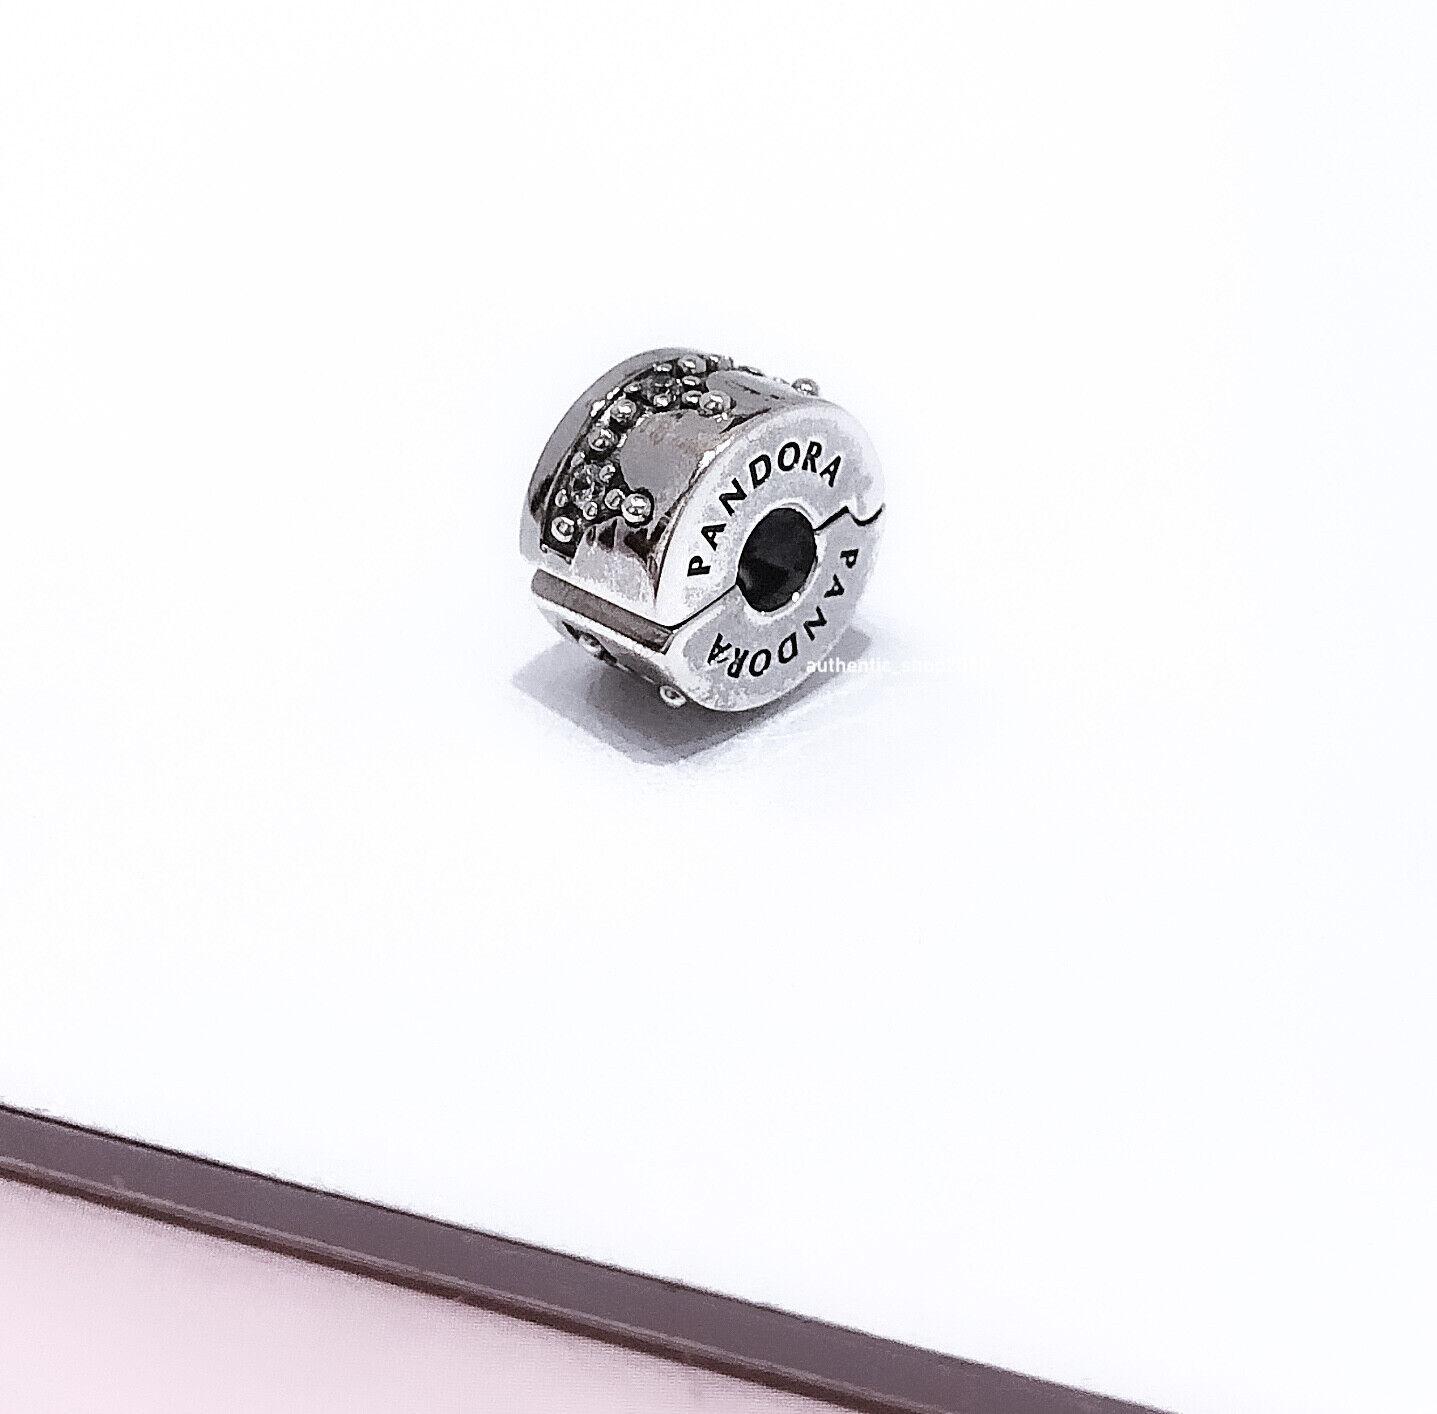 Sterling Silver 14.6x9.4 mm Kera Crown Charm Kera Crown Charm